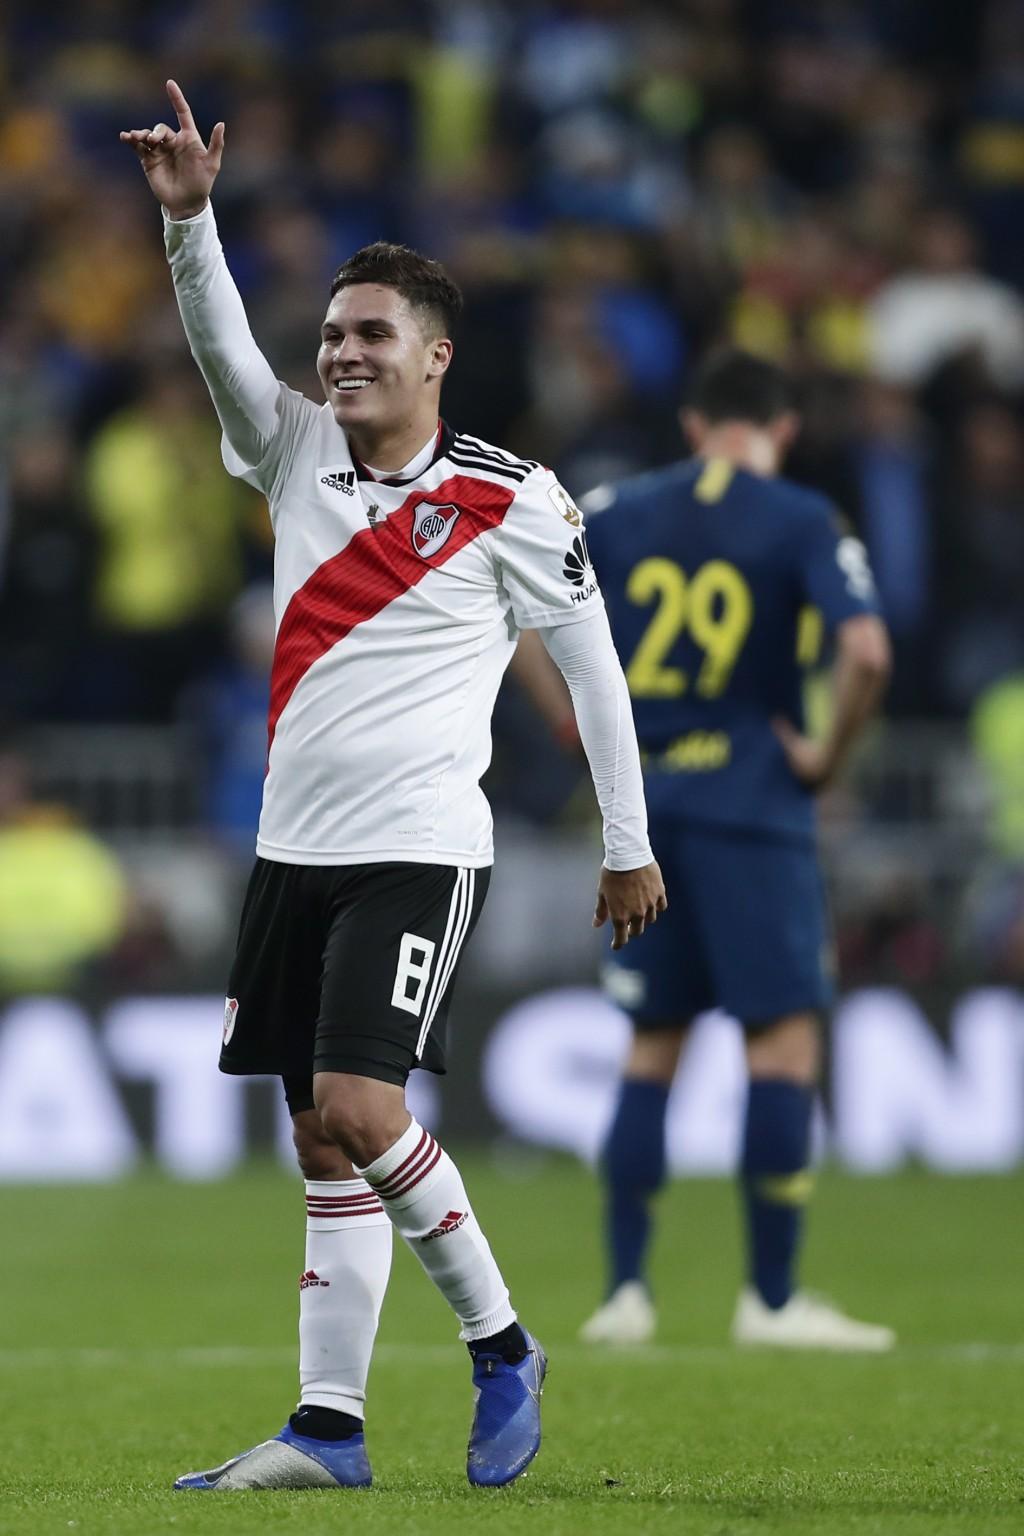 Juan Quintero of Argentina's River Plate celebrates beating 3-1 Argentina's Boca Juniors during the Copa Libertadores final soccer match at the Santia